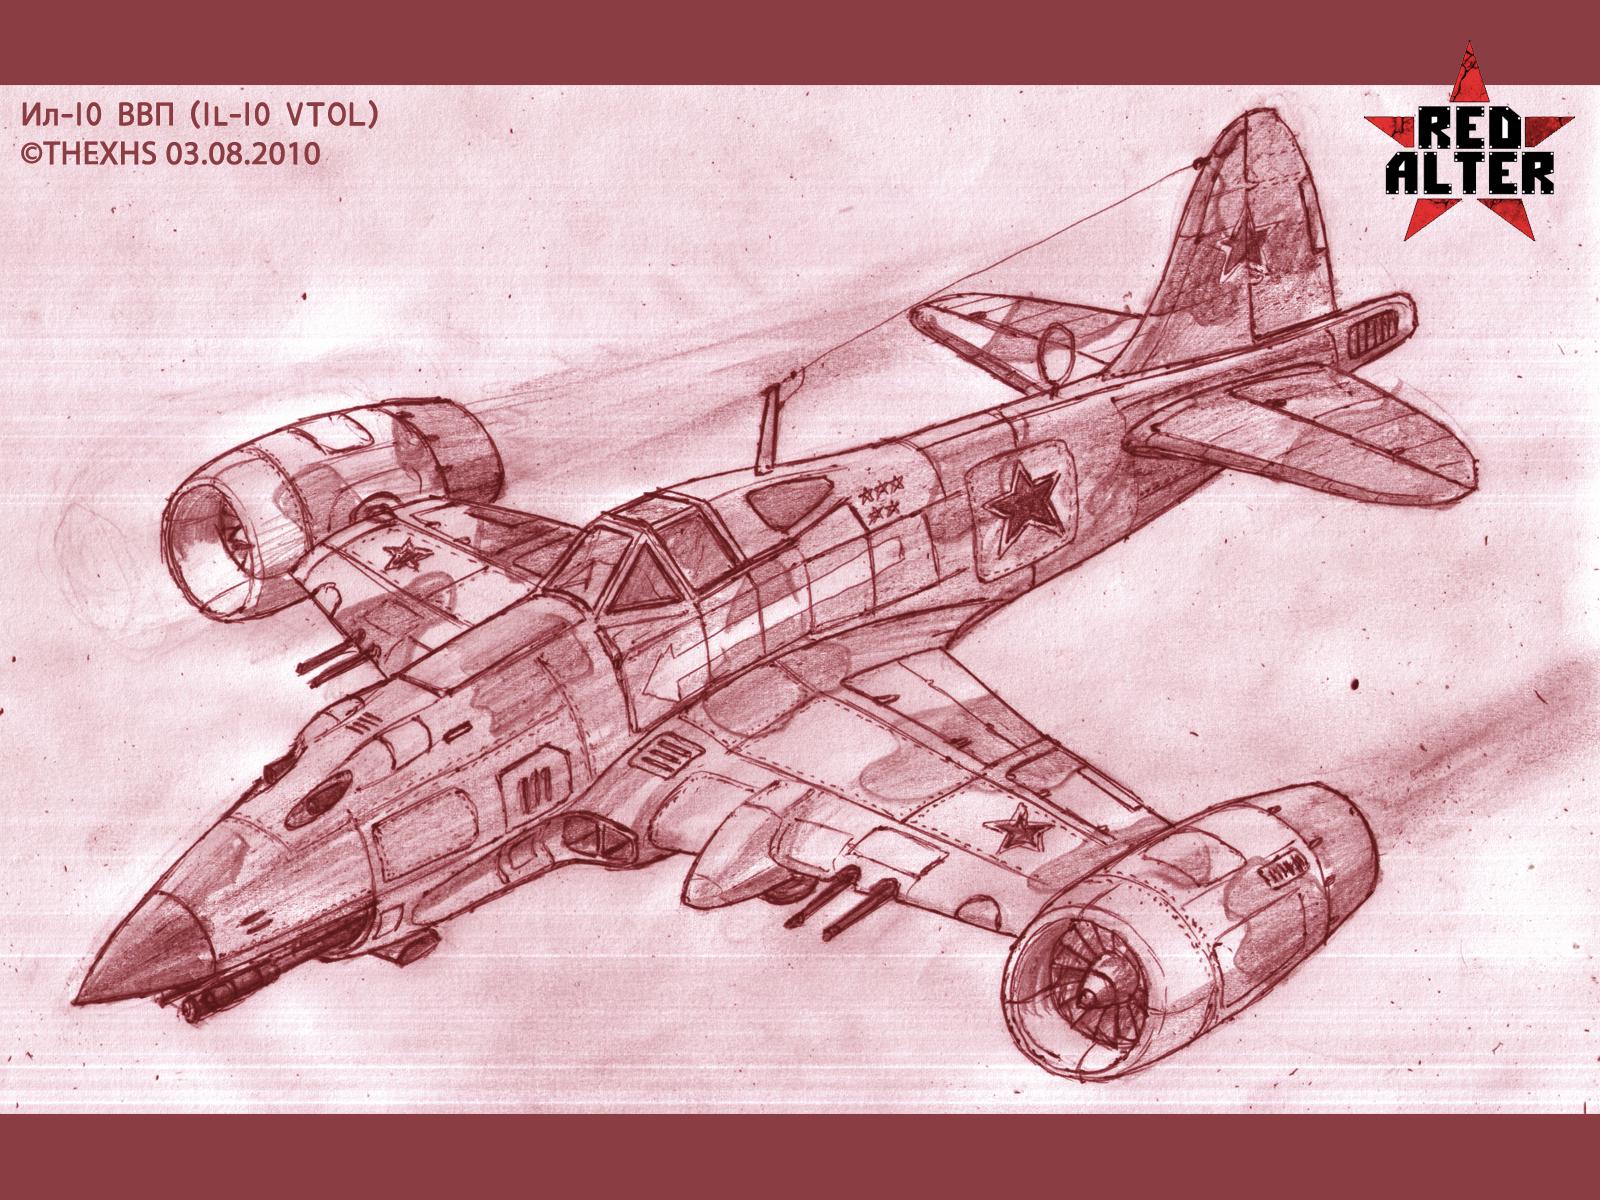 1600 x 1200 · 1905 kB · jpeg, Soviet gunship IL-10 VTOL image - Red